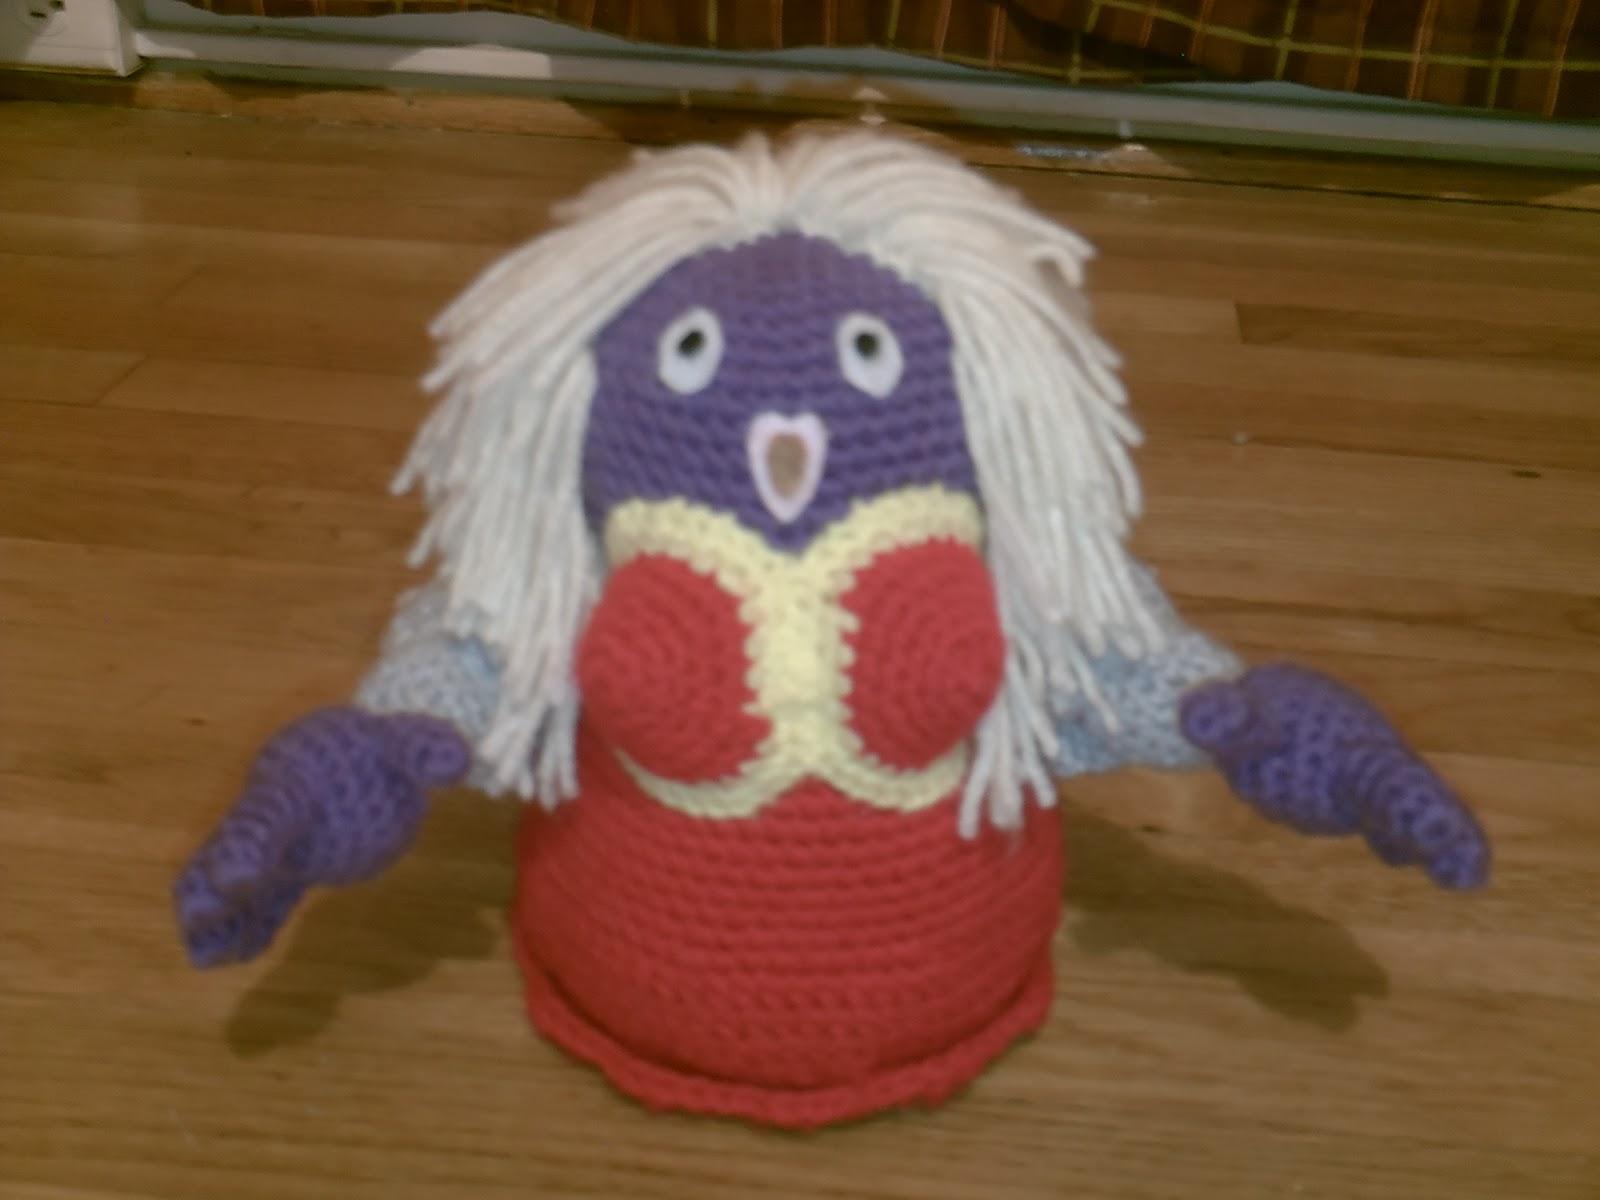 Free Knitted Amigurumi : Amigurumi knitted and crocheted the psychic ice type johto